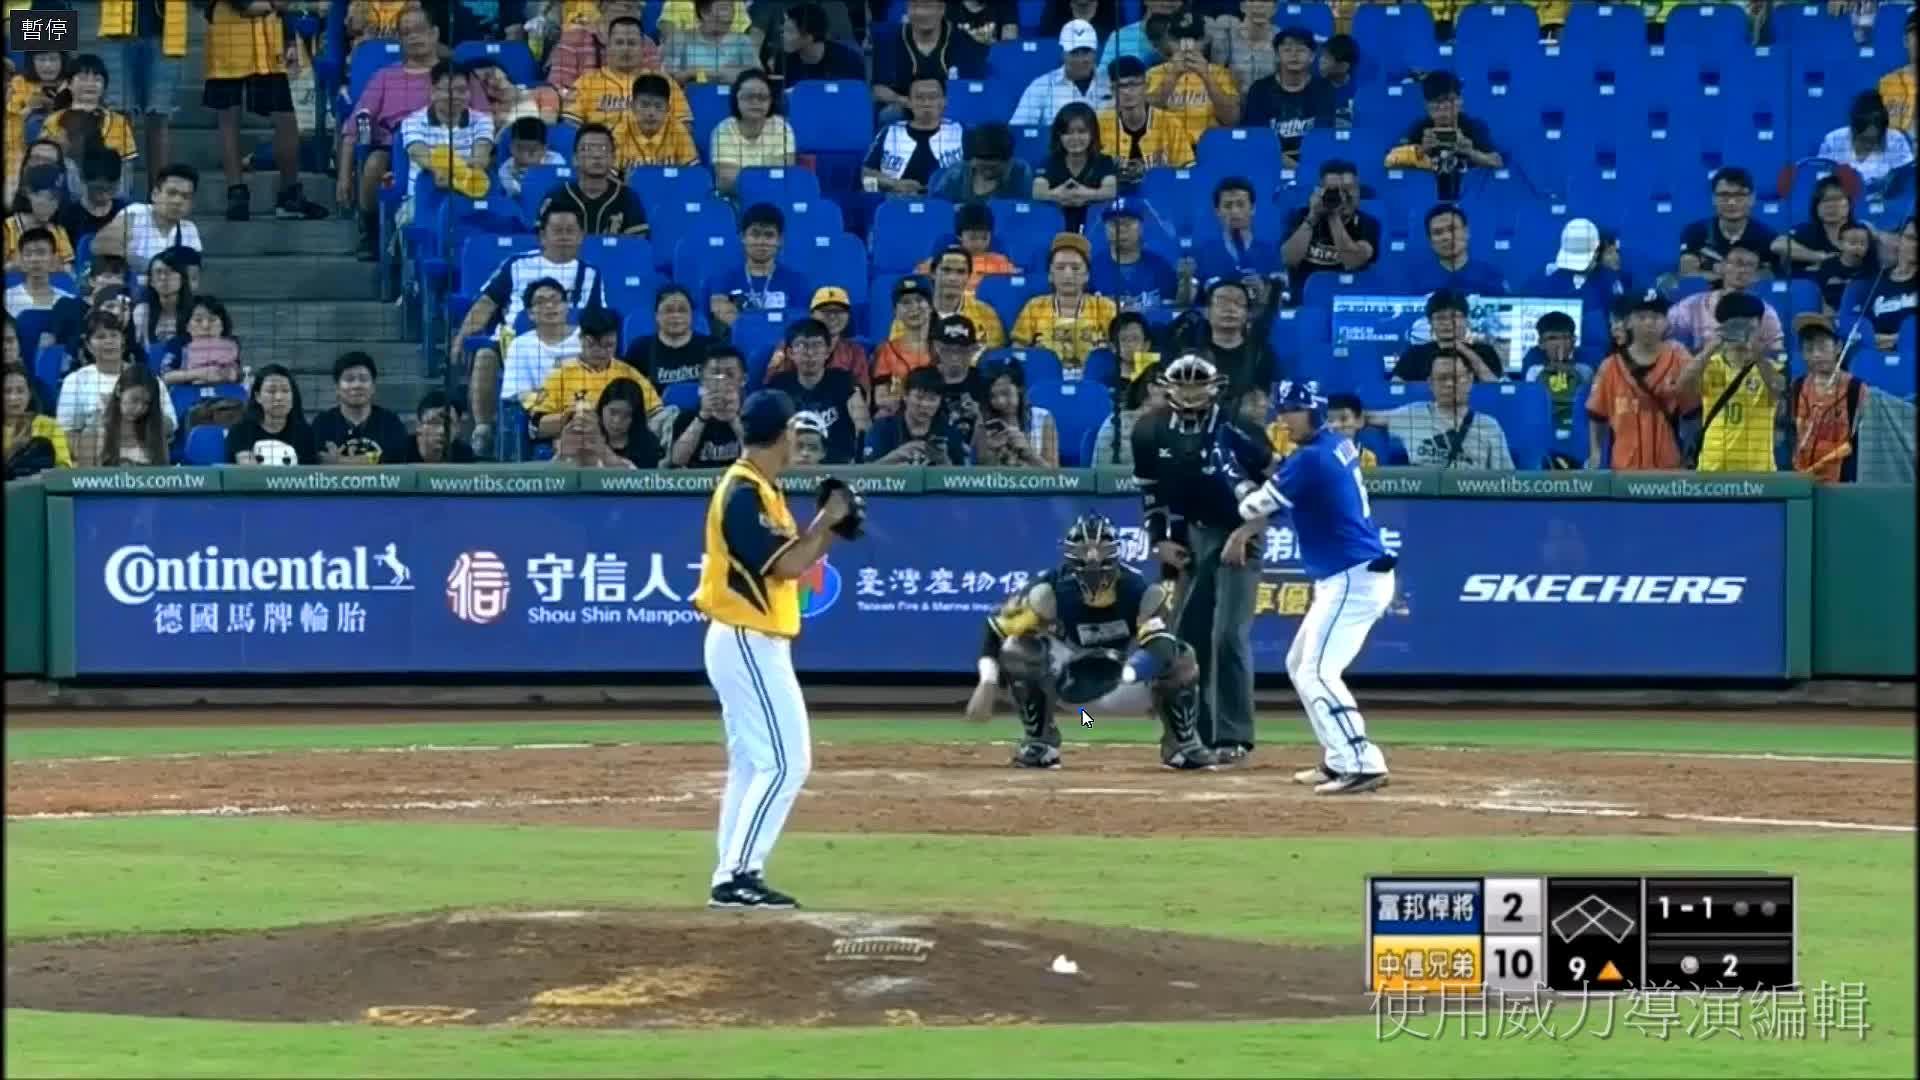 baseball, fast GIFs